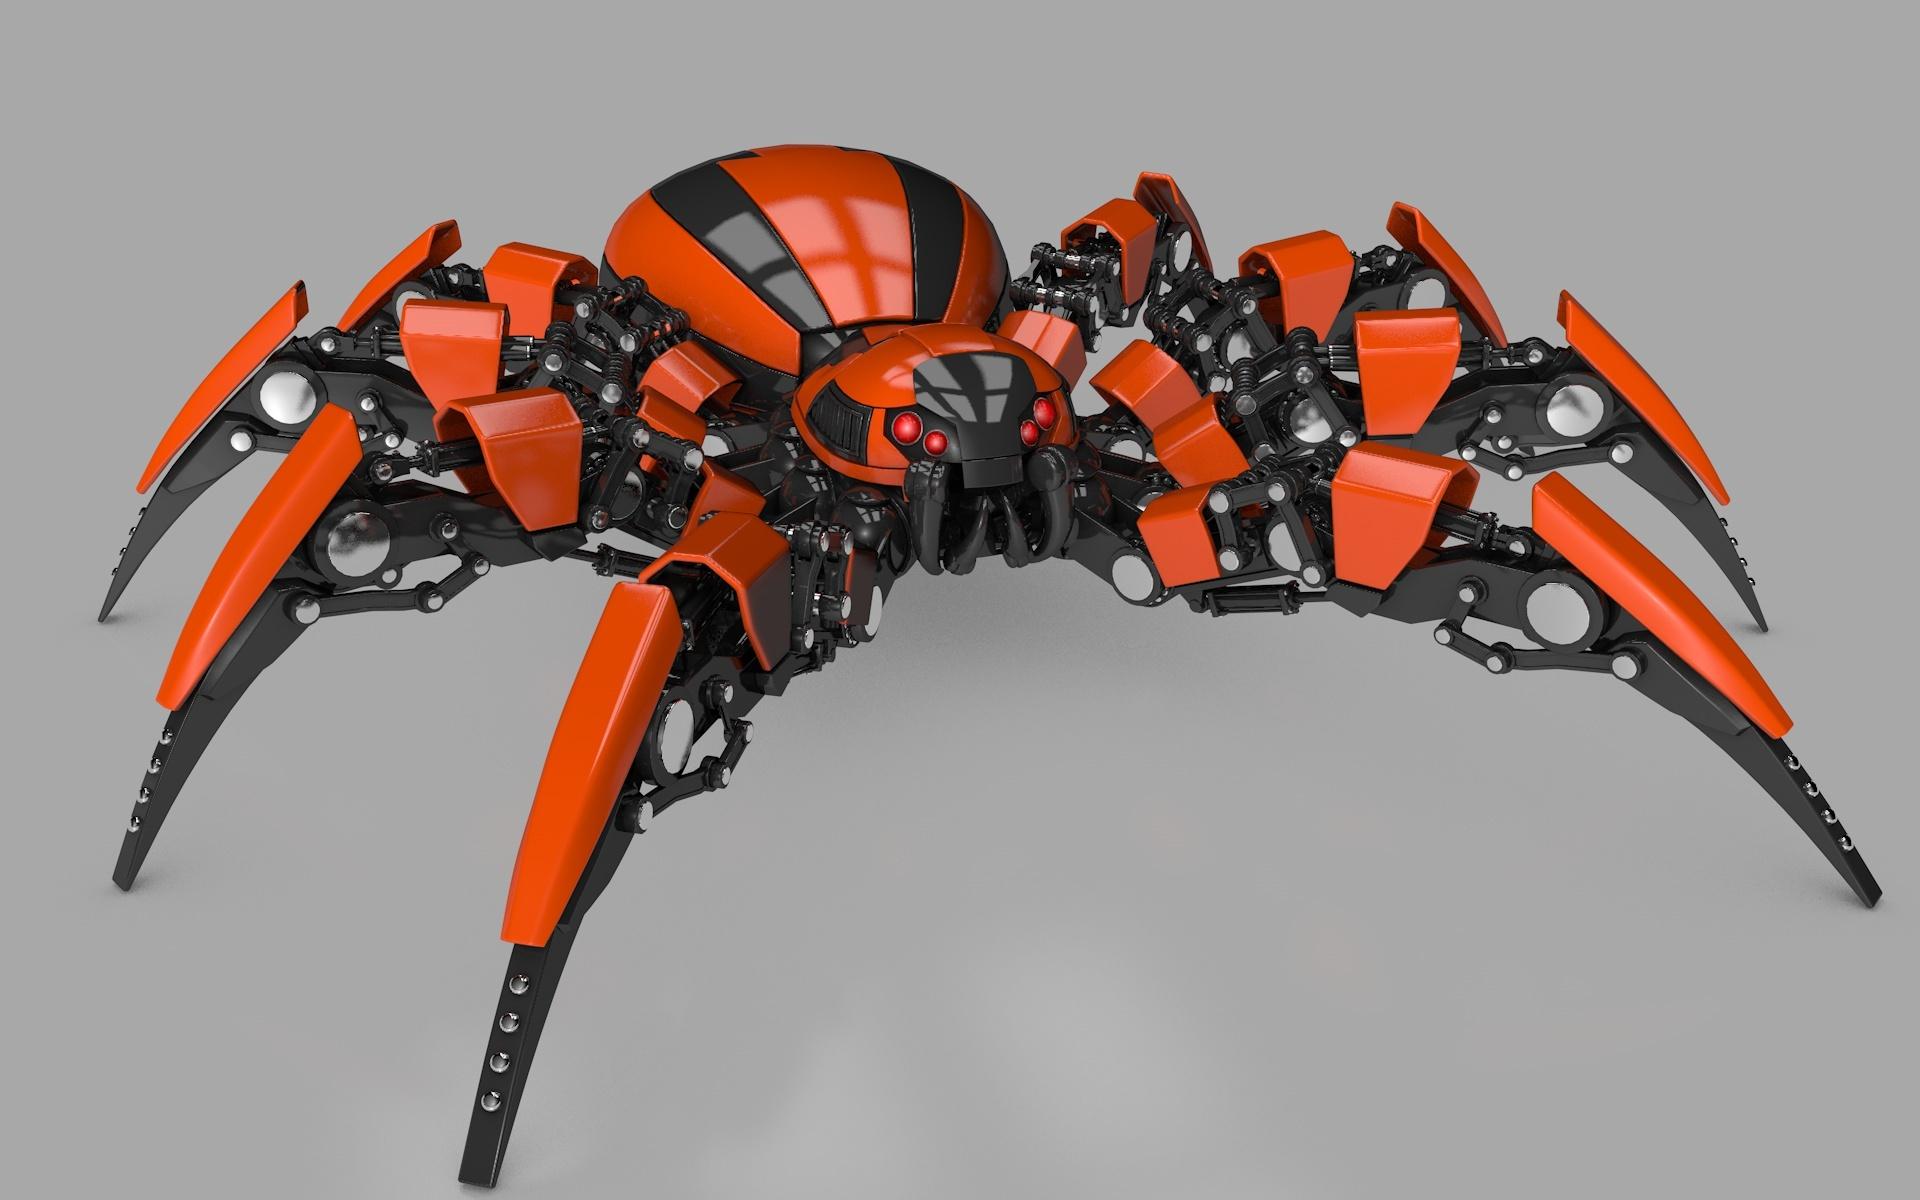 Model Cars For Sale >> Spider Robot by Vladim00719 | 3DOcean